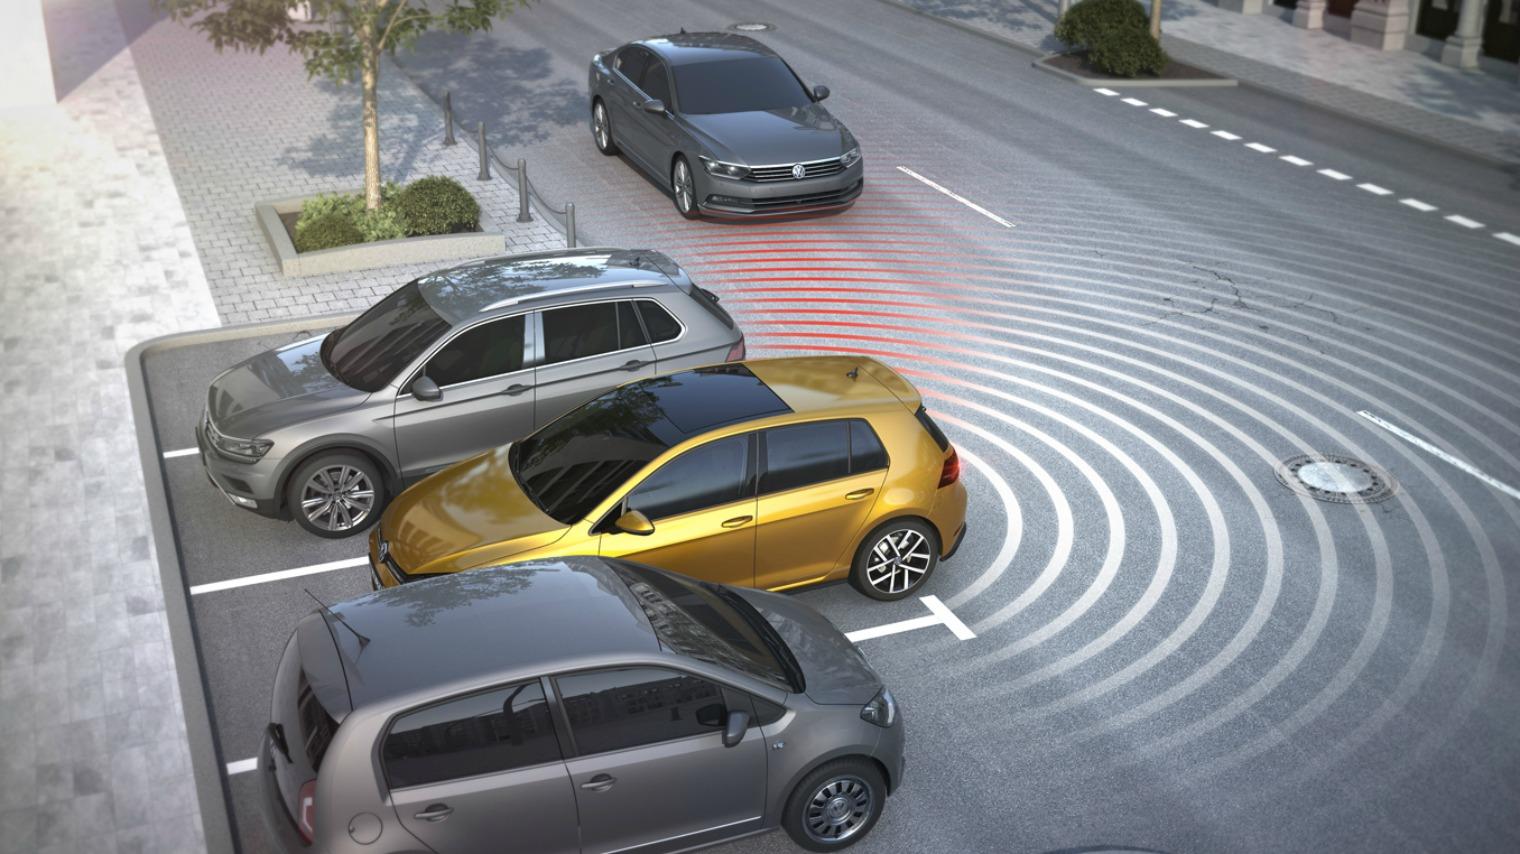 come funziona Rear Cross Traffic Alert